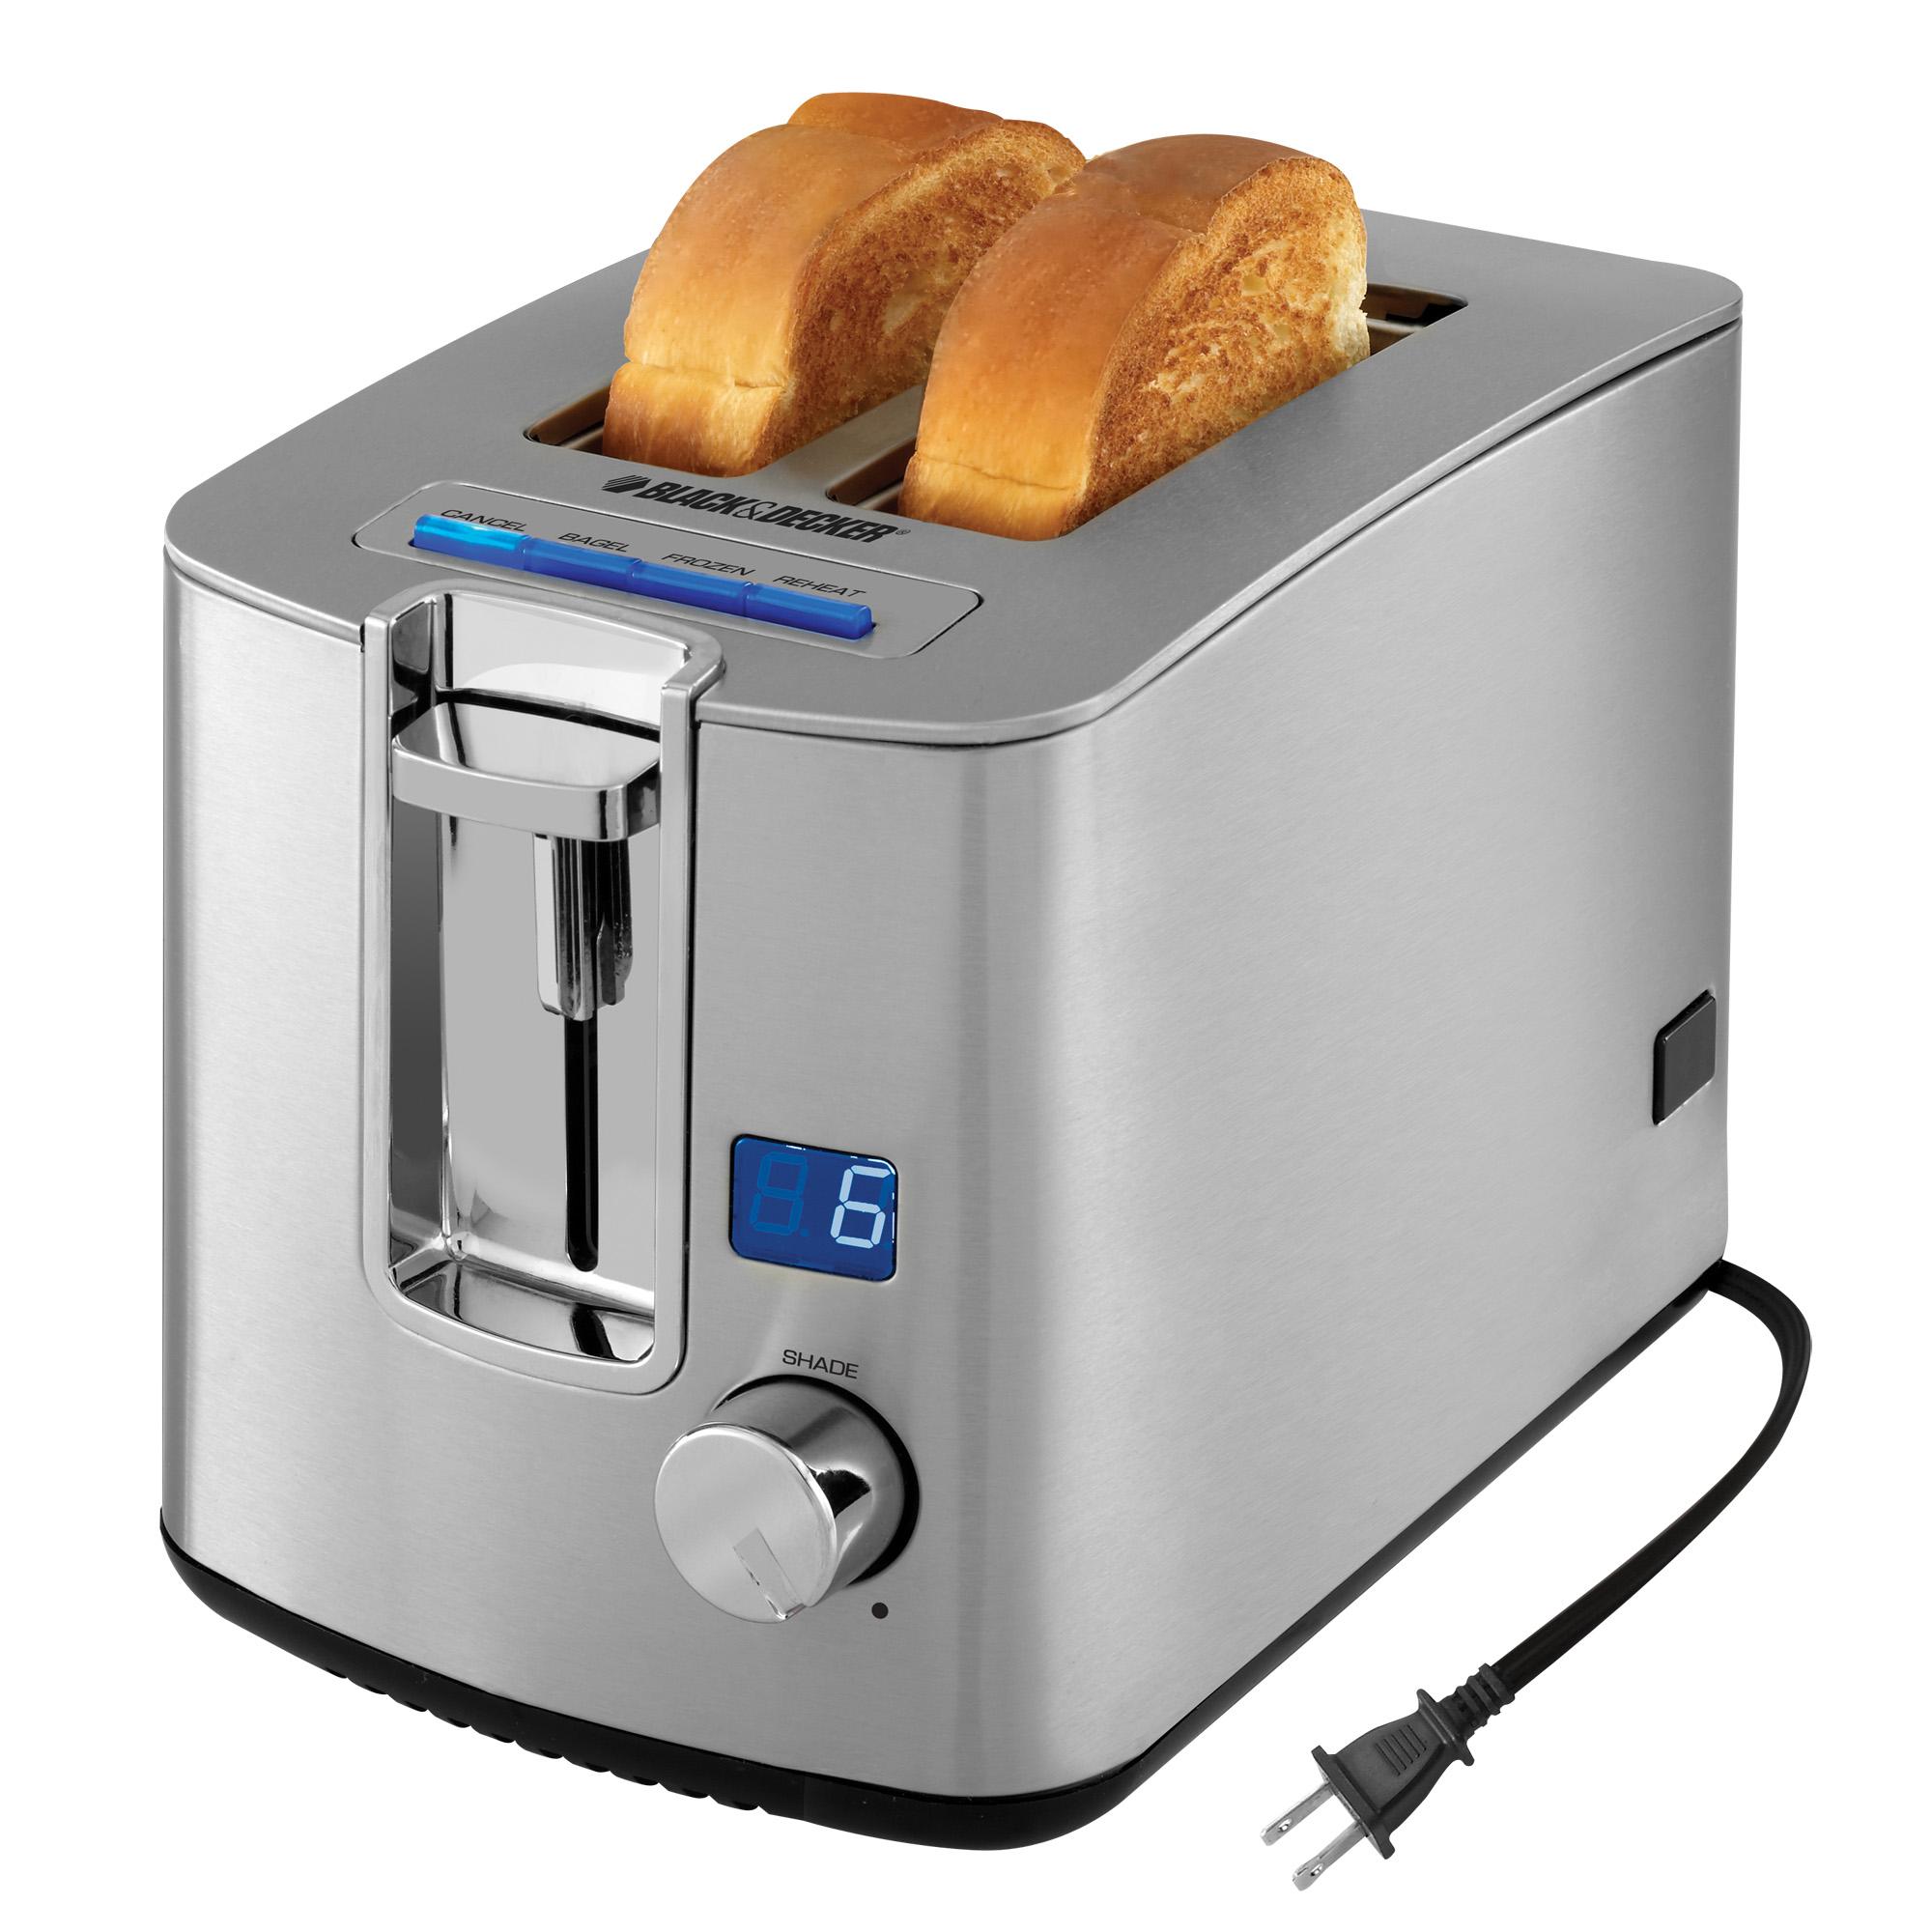 BLACK+DECKER 2-Slice Toaster, Stainless Steel, TR1280S